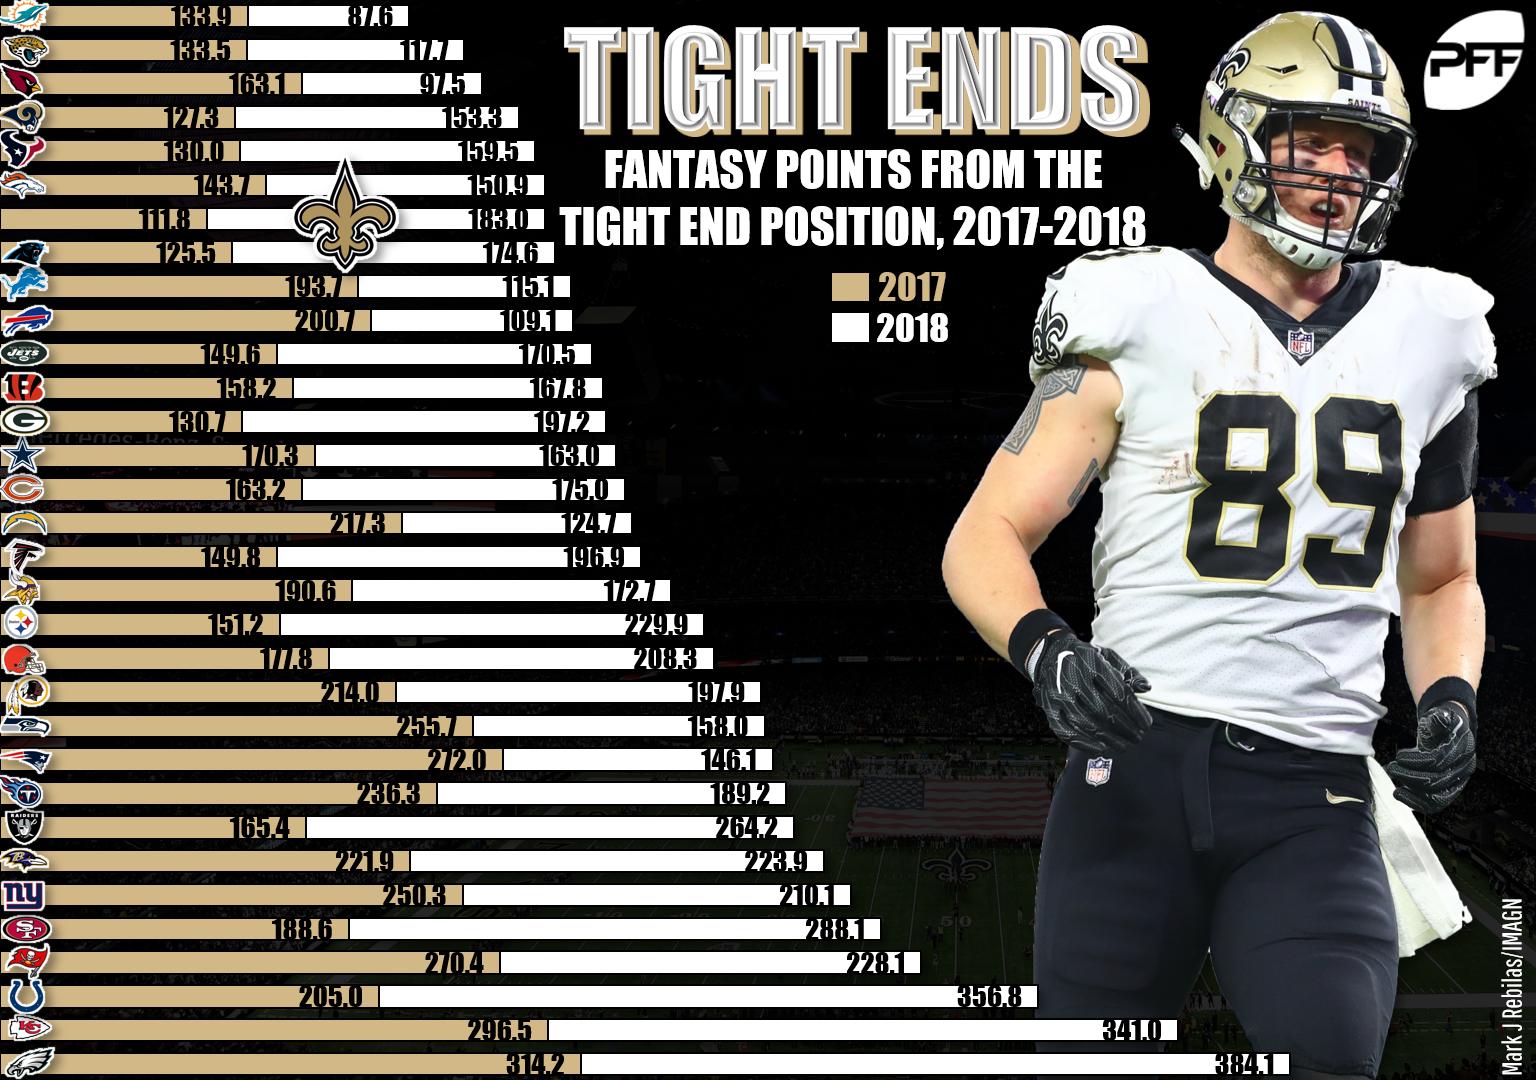 Fantasy football wish list 2019: New Orleans Saints